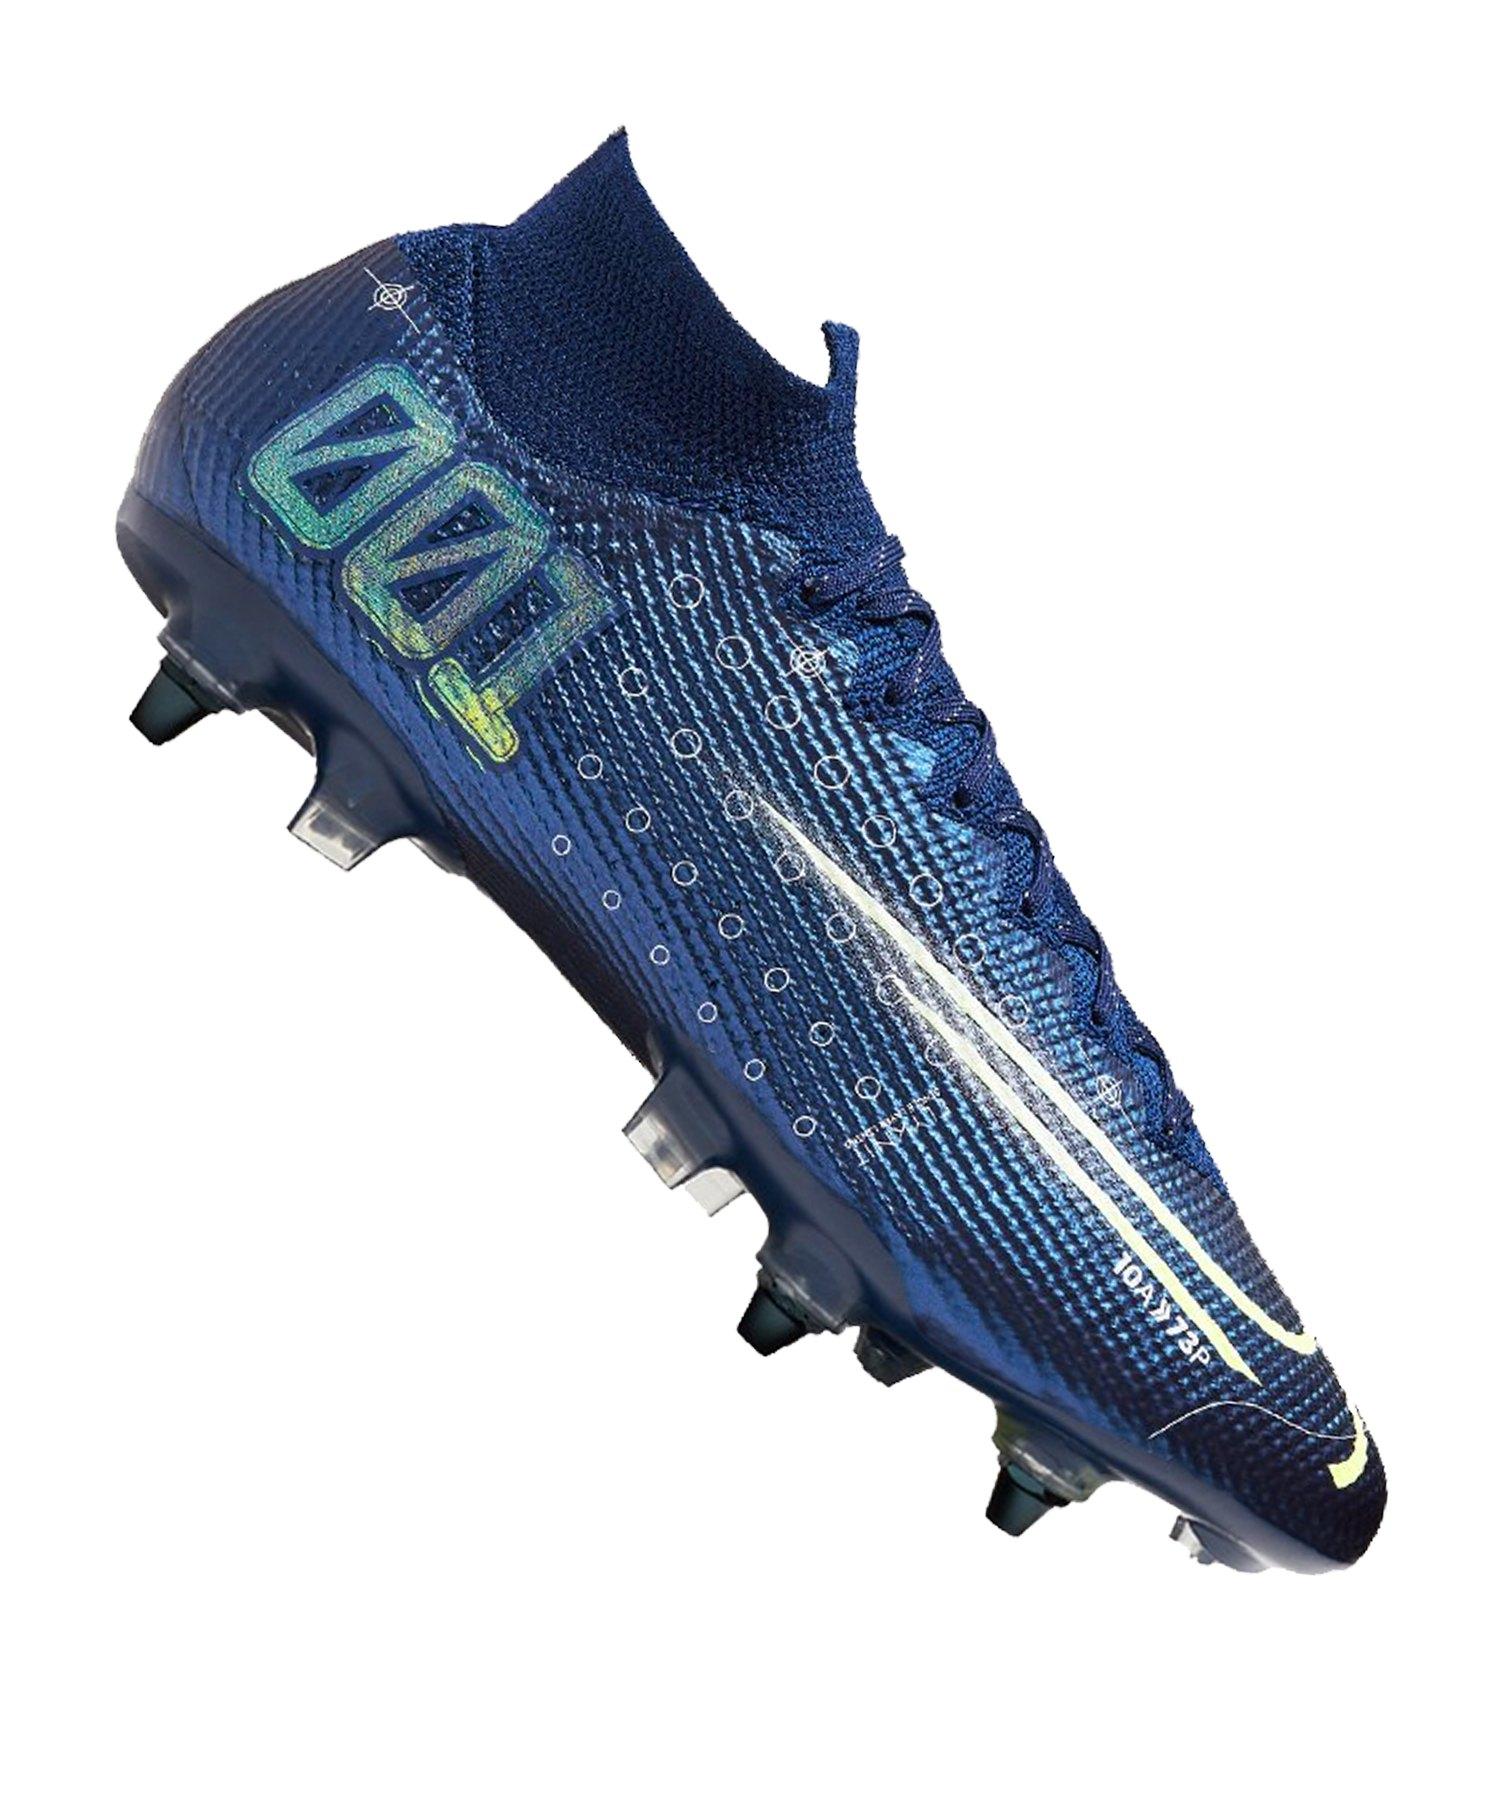 Nike Mercurial Superfly VII Dreamspeed Elite SG-Pro Blau F401 - blau